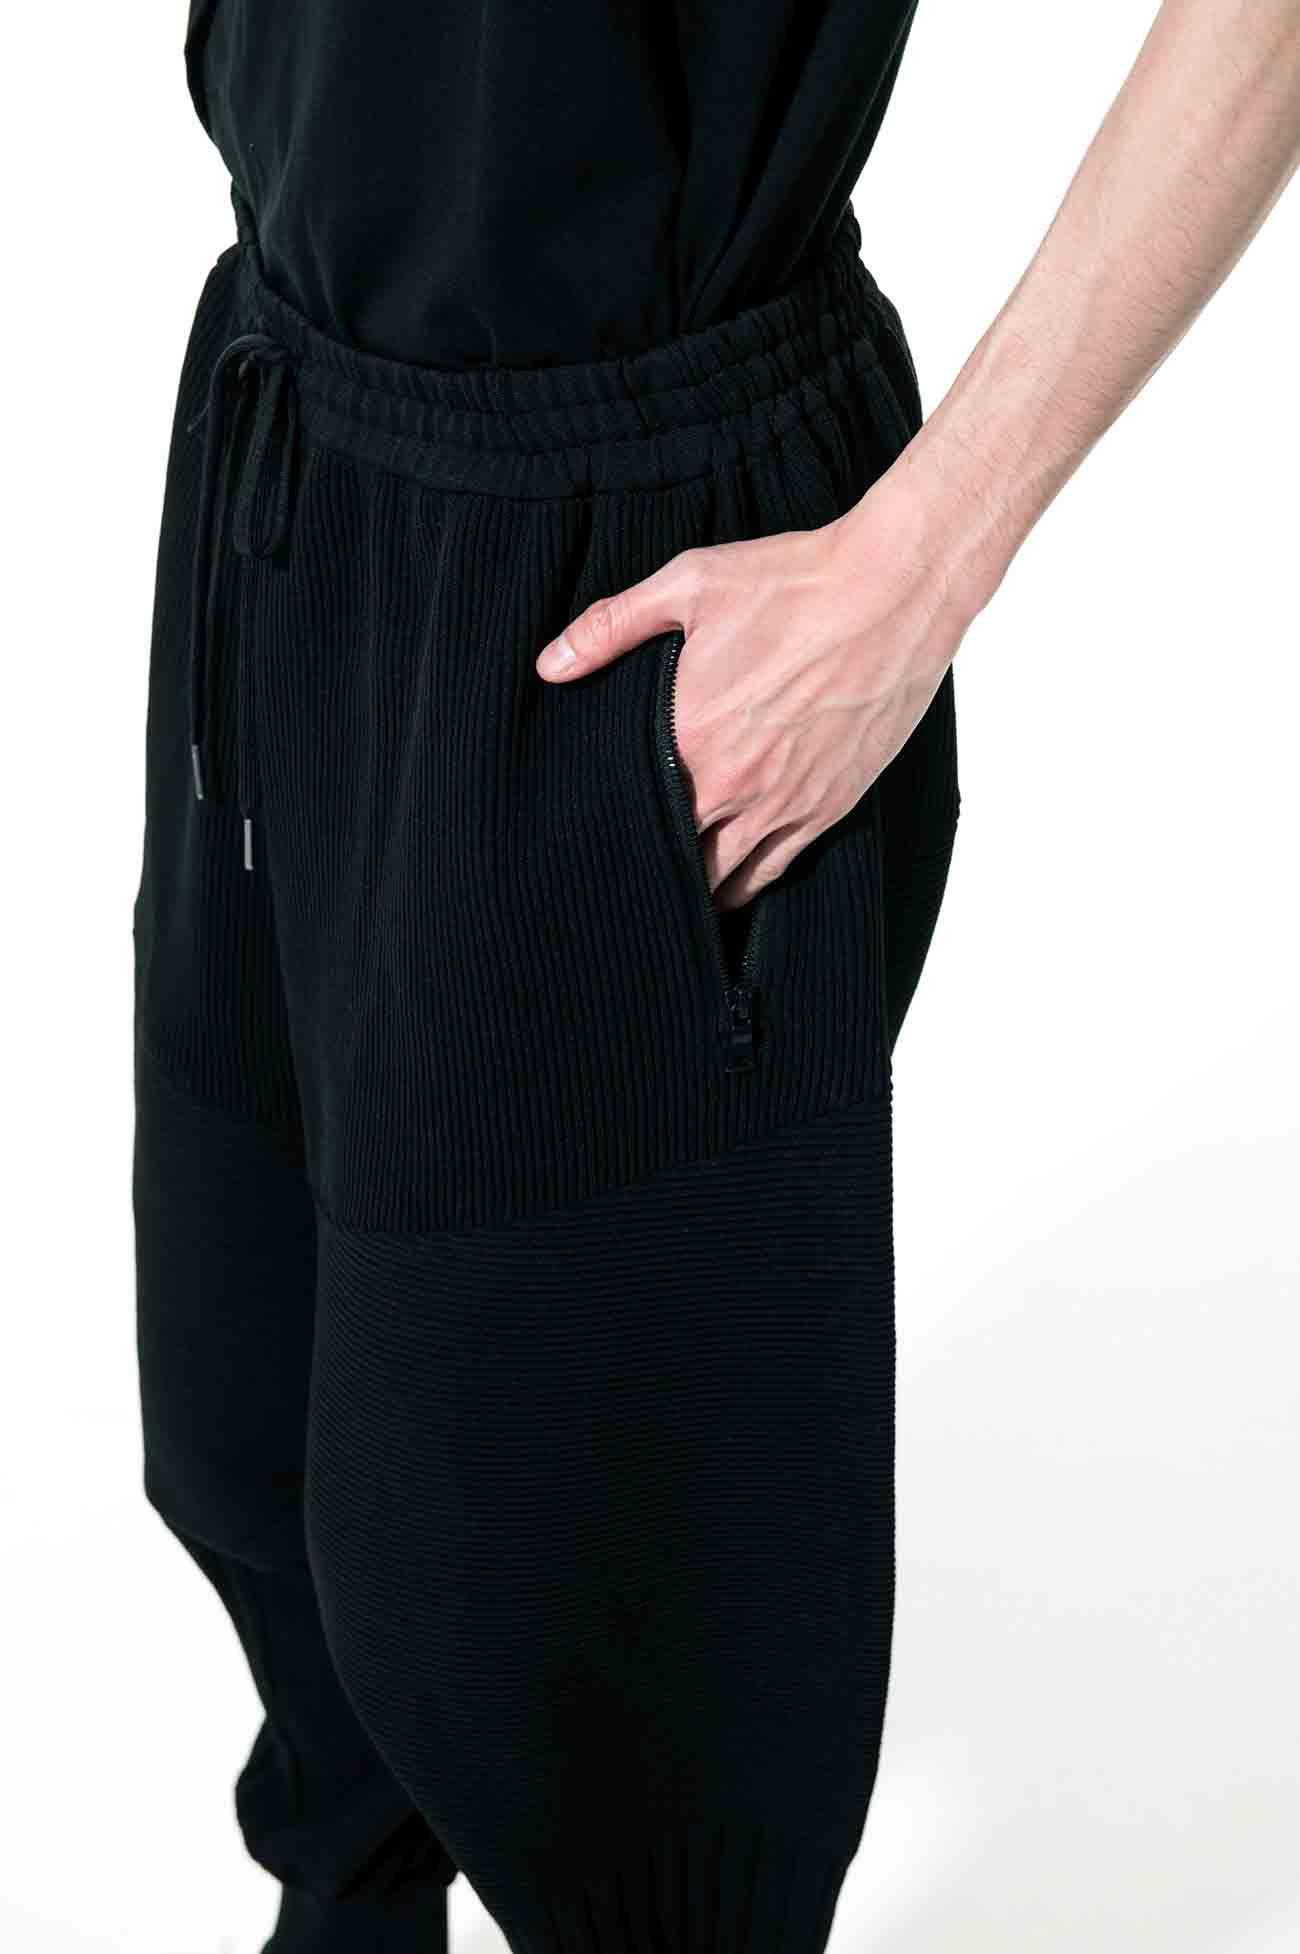 12G Spritzy Plain Stitches Hem Rib Balloon Saruel Pants